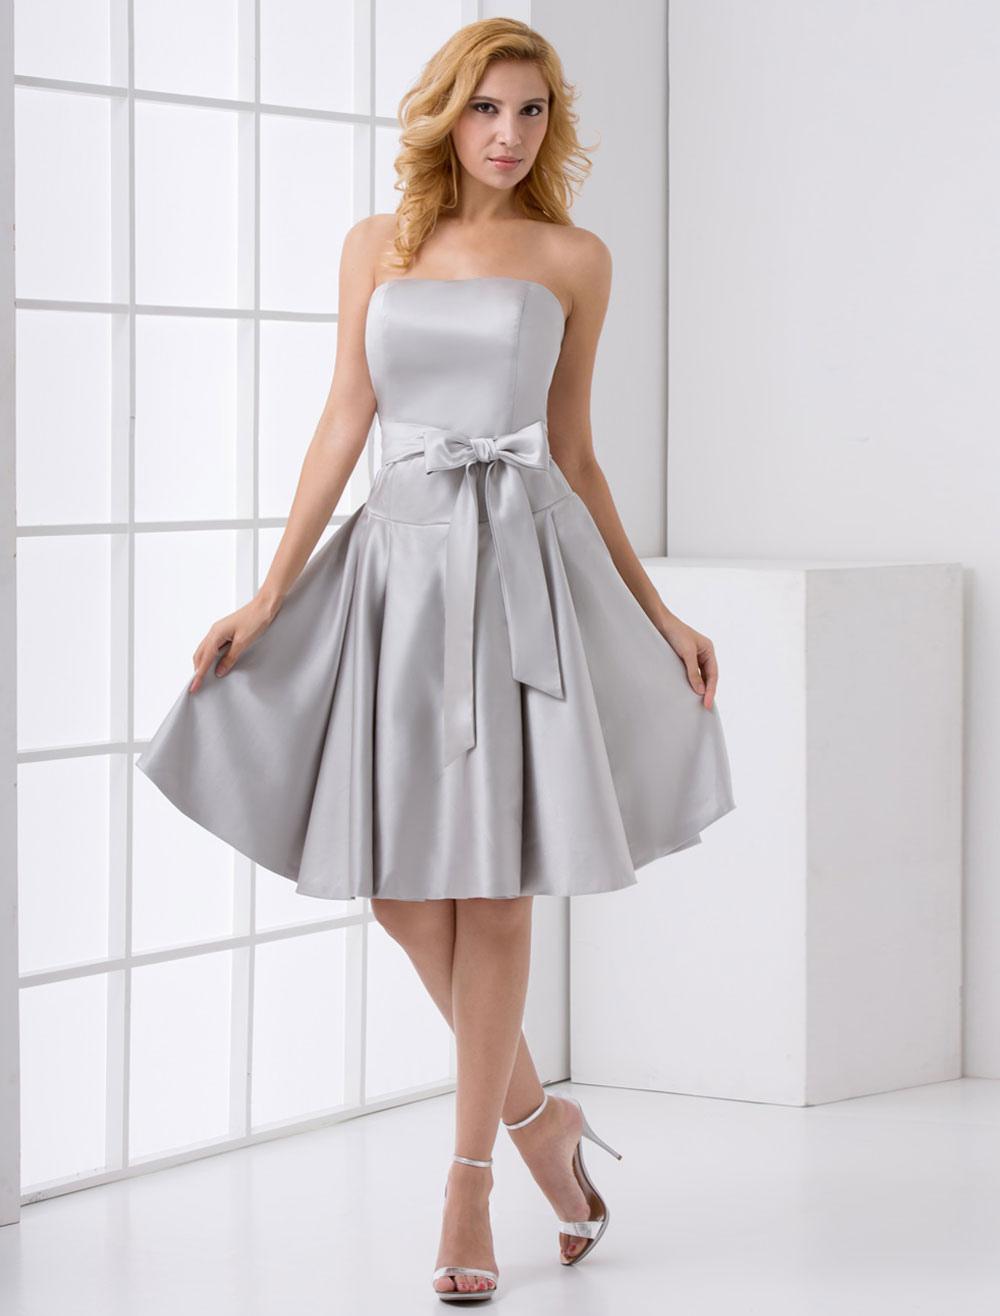 Silver Bridesmaid Dress Short Grey Satin Cocktail Dress With Bow Sash (Wedding Bridesmaid Dresses) photo